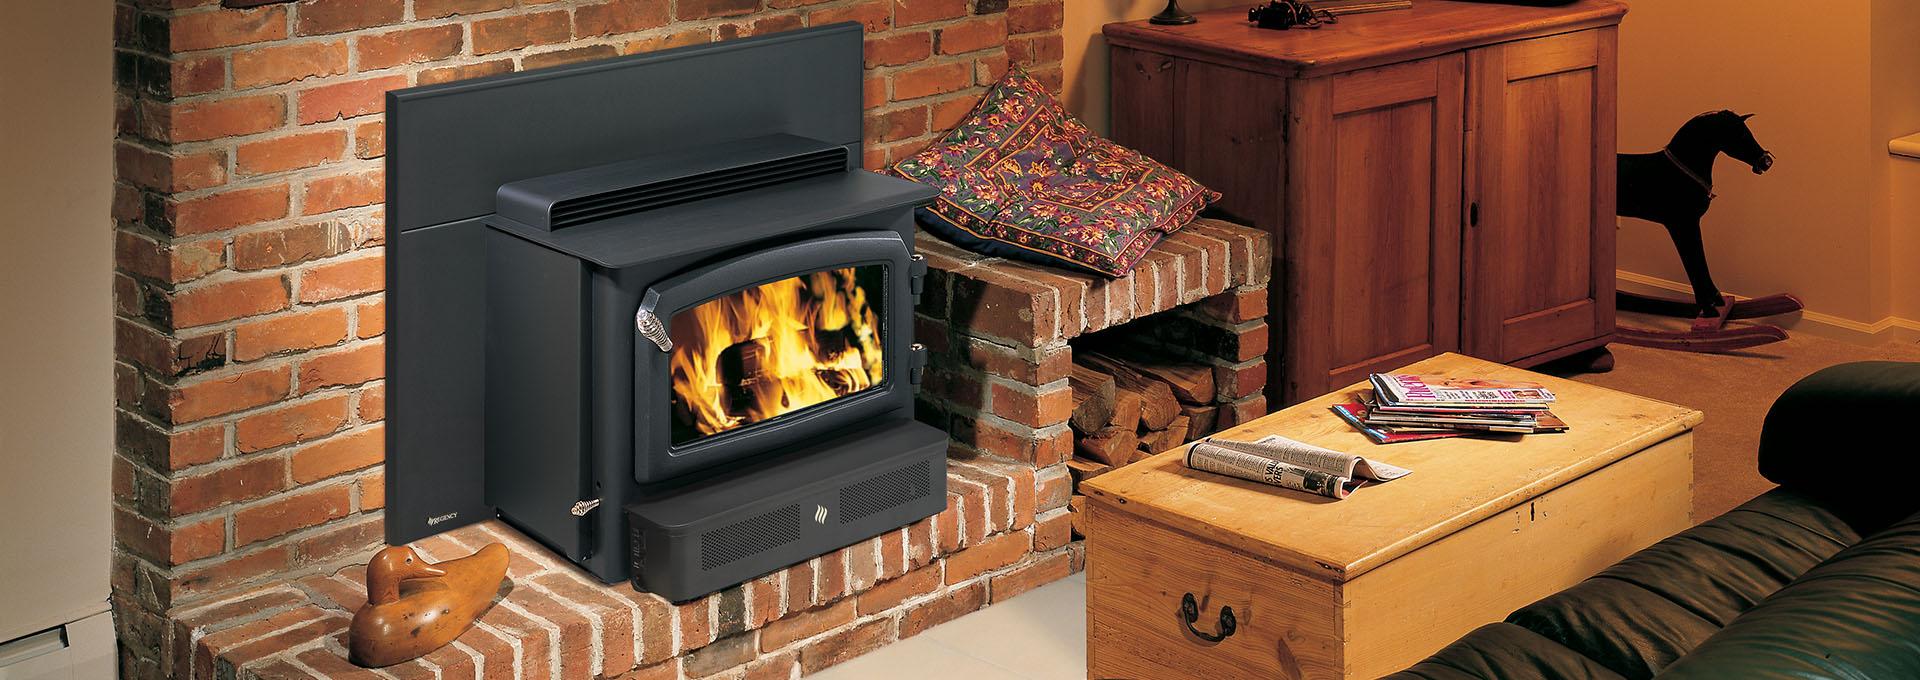 Fireplaces Wood Fireplace Inserts Wood Fireplaces